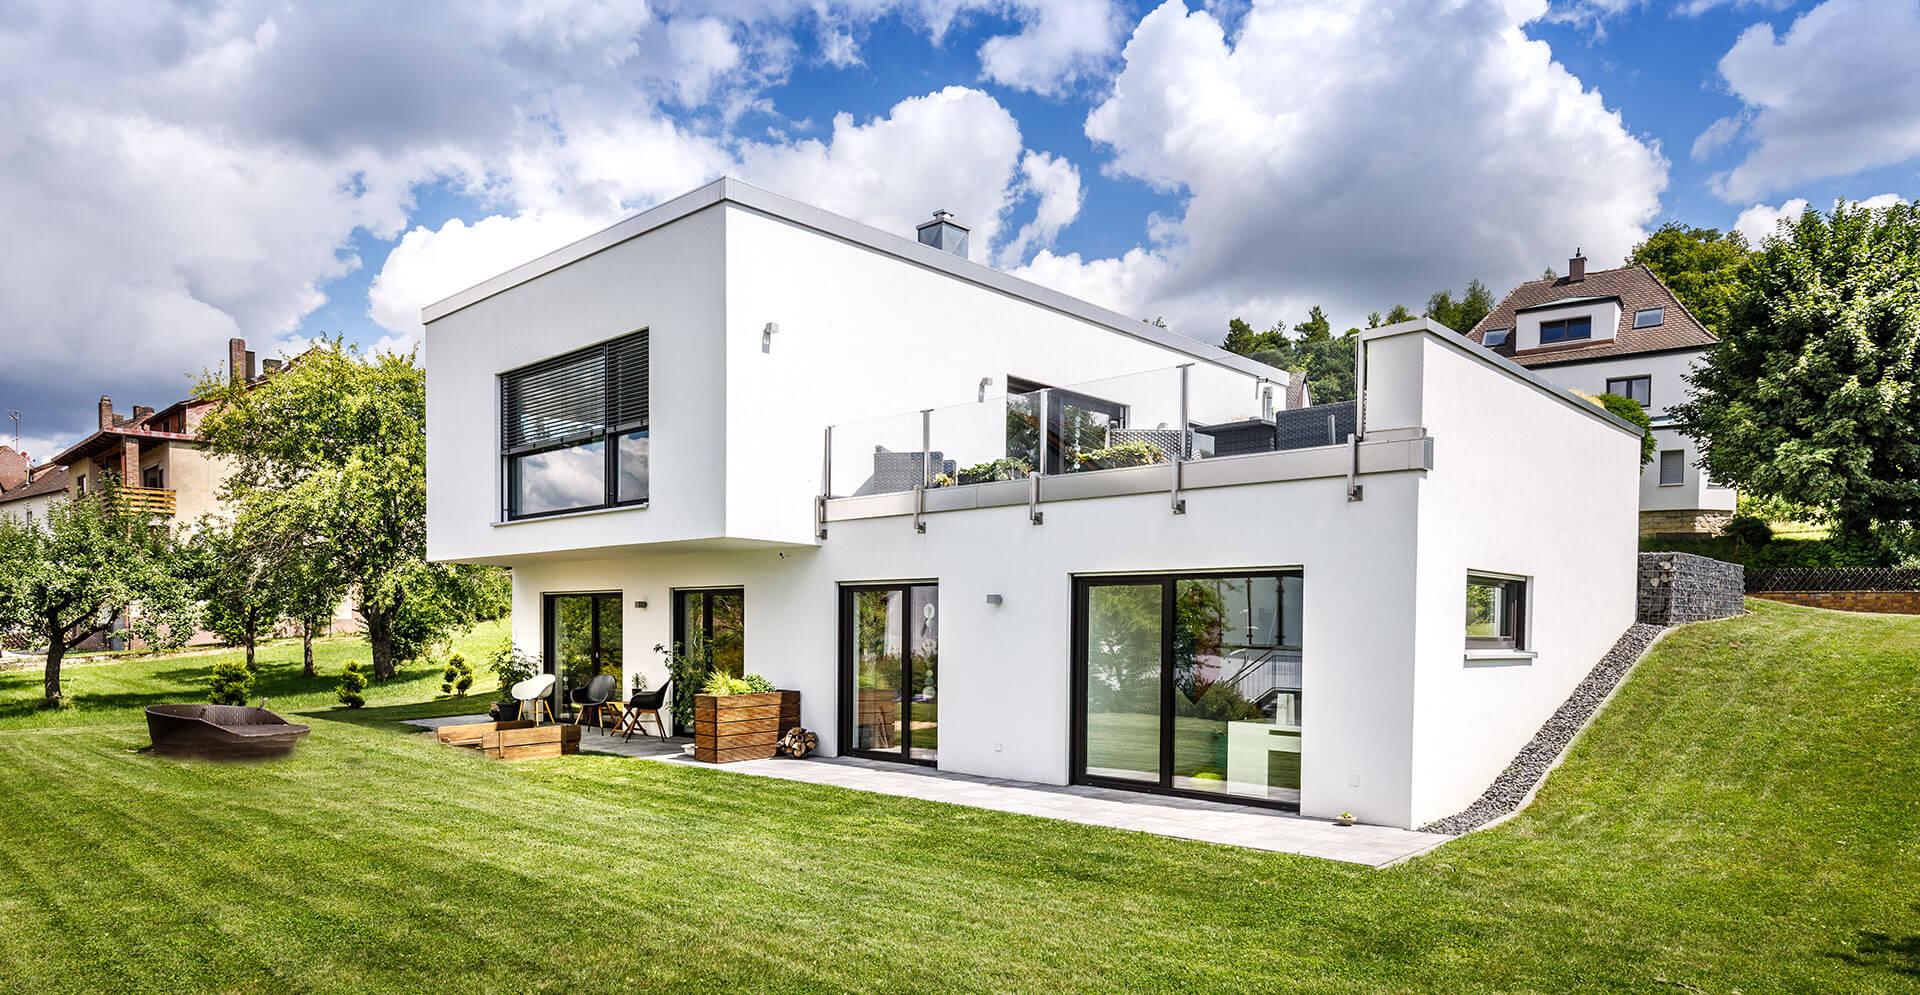 massivhaus affordable massivhaus with massivhaus cool massivhaus mira zimmer m nutzflche with. Black Bedroom Furniture Sets. Home Design Ideas